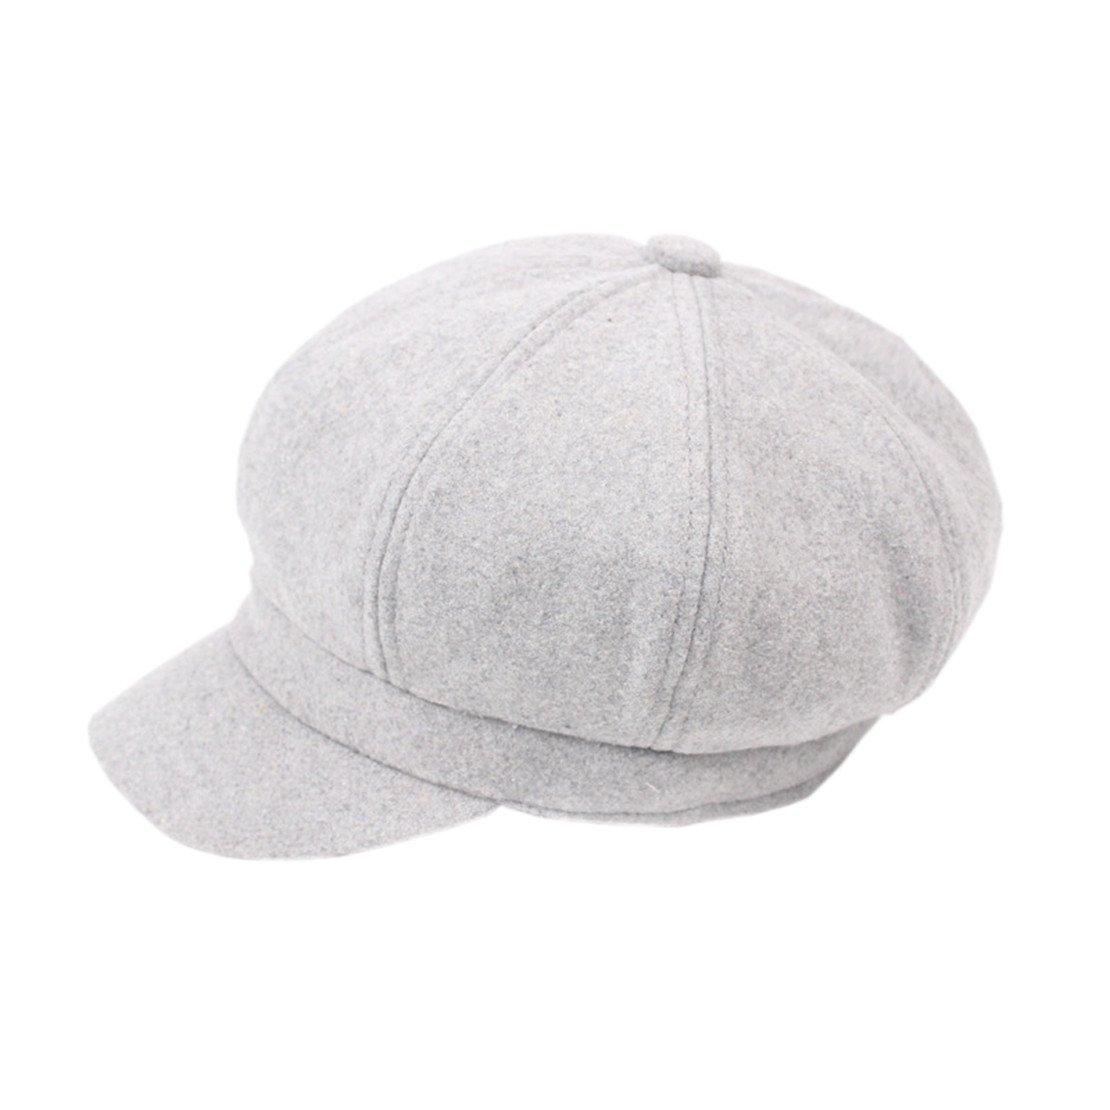 TM XueXian Womens Mens Wool Bakerboy Newsboy Hat Beret Solid Color